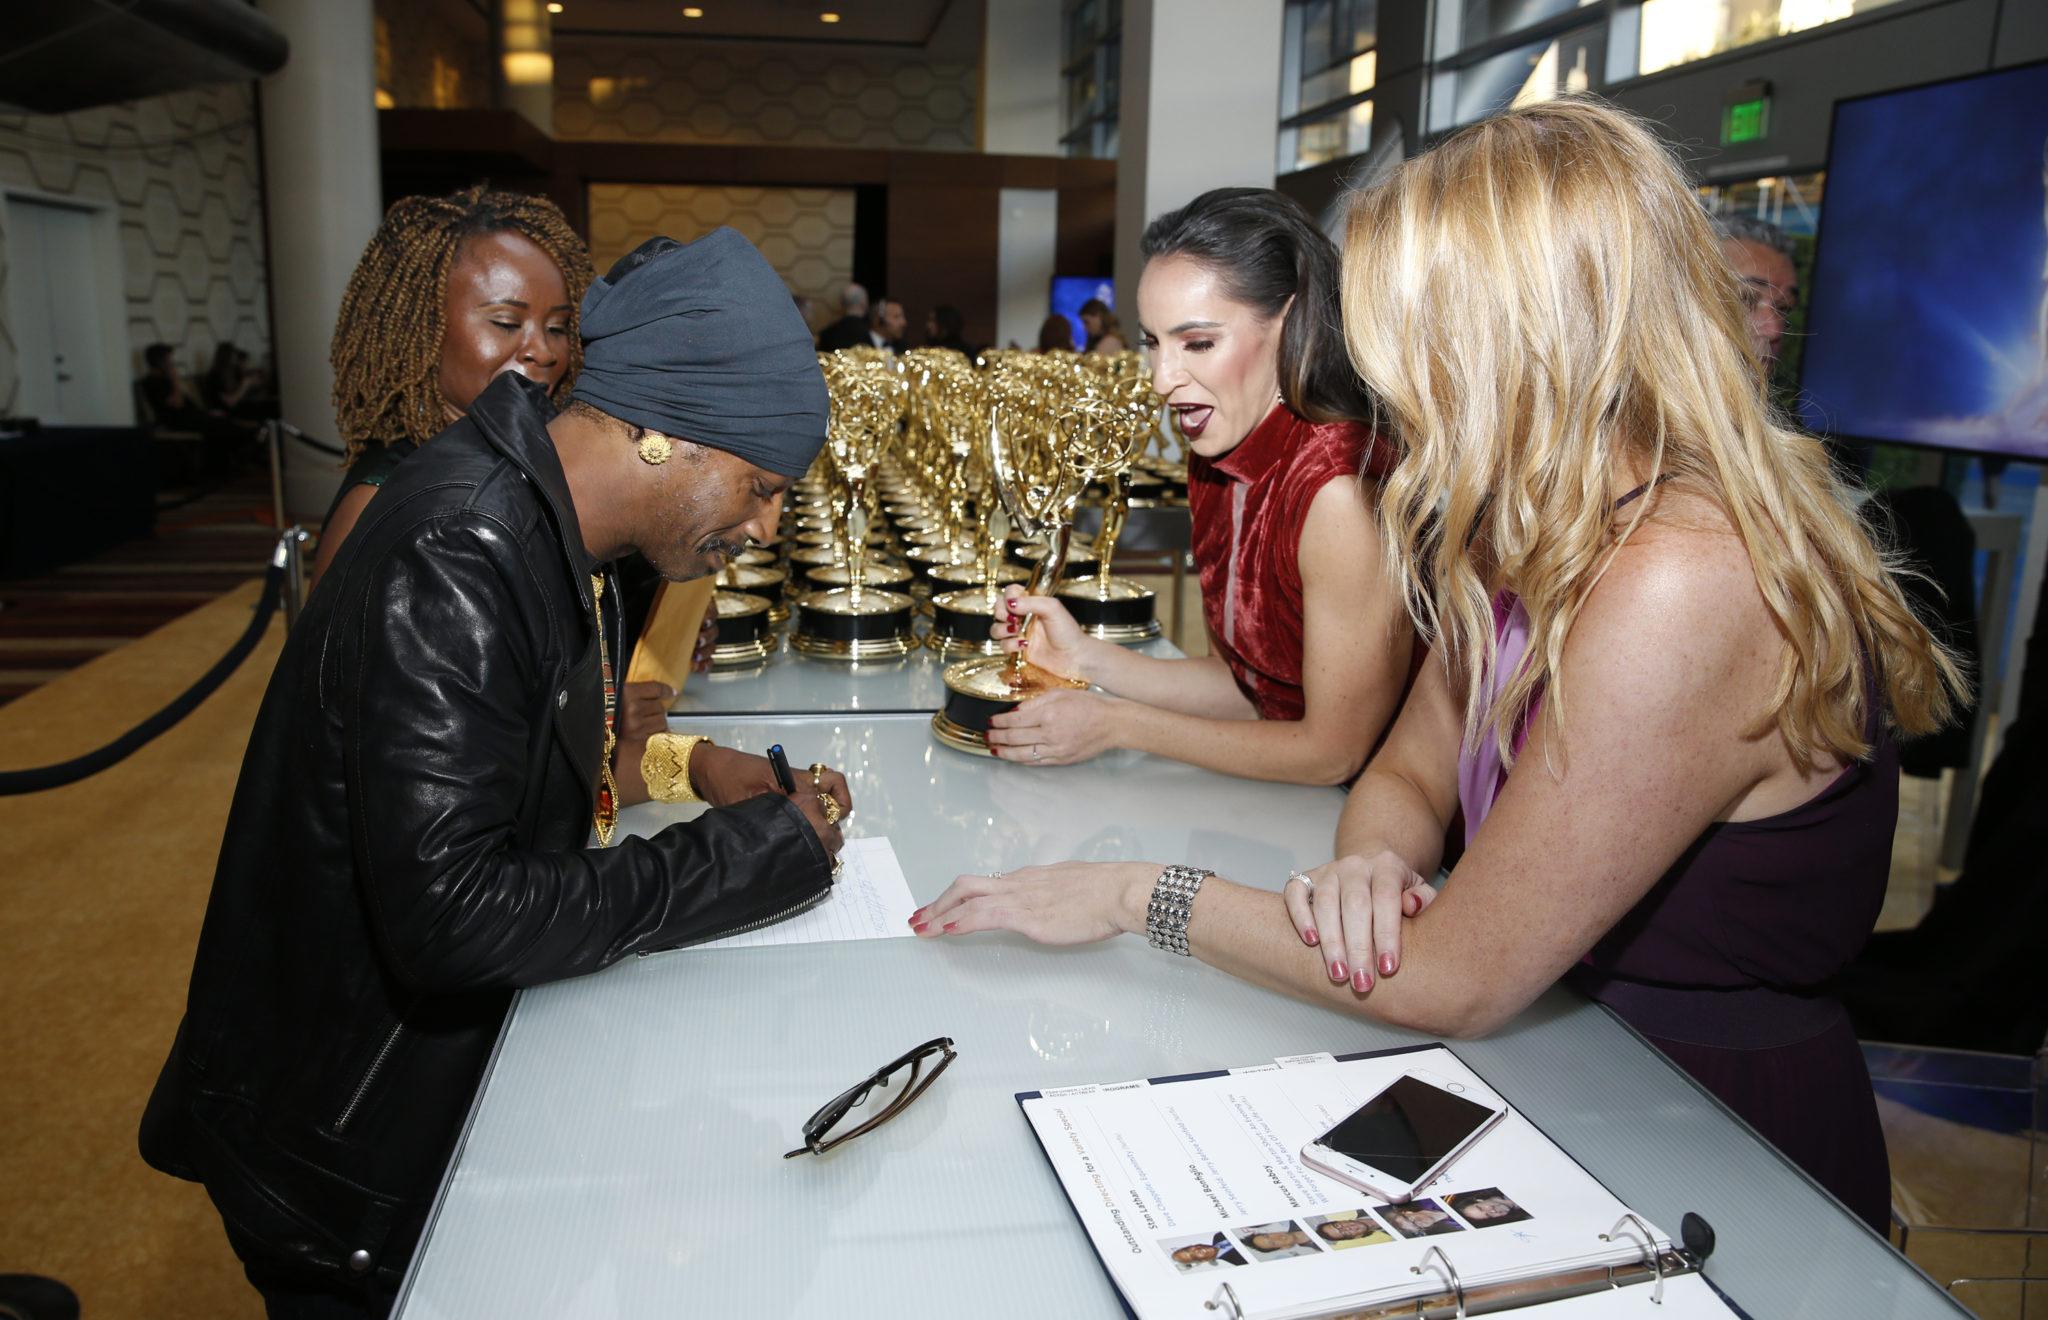 Katt Williams Emmys® 4Chion Lifestyle